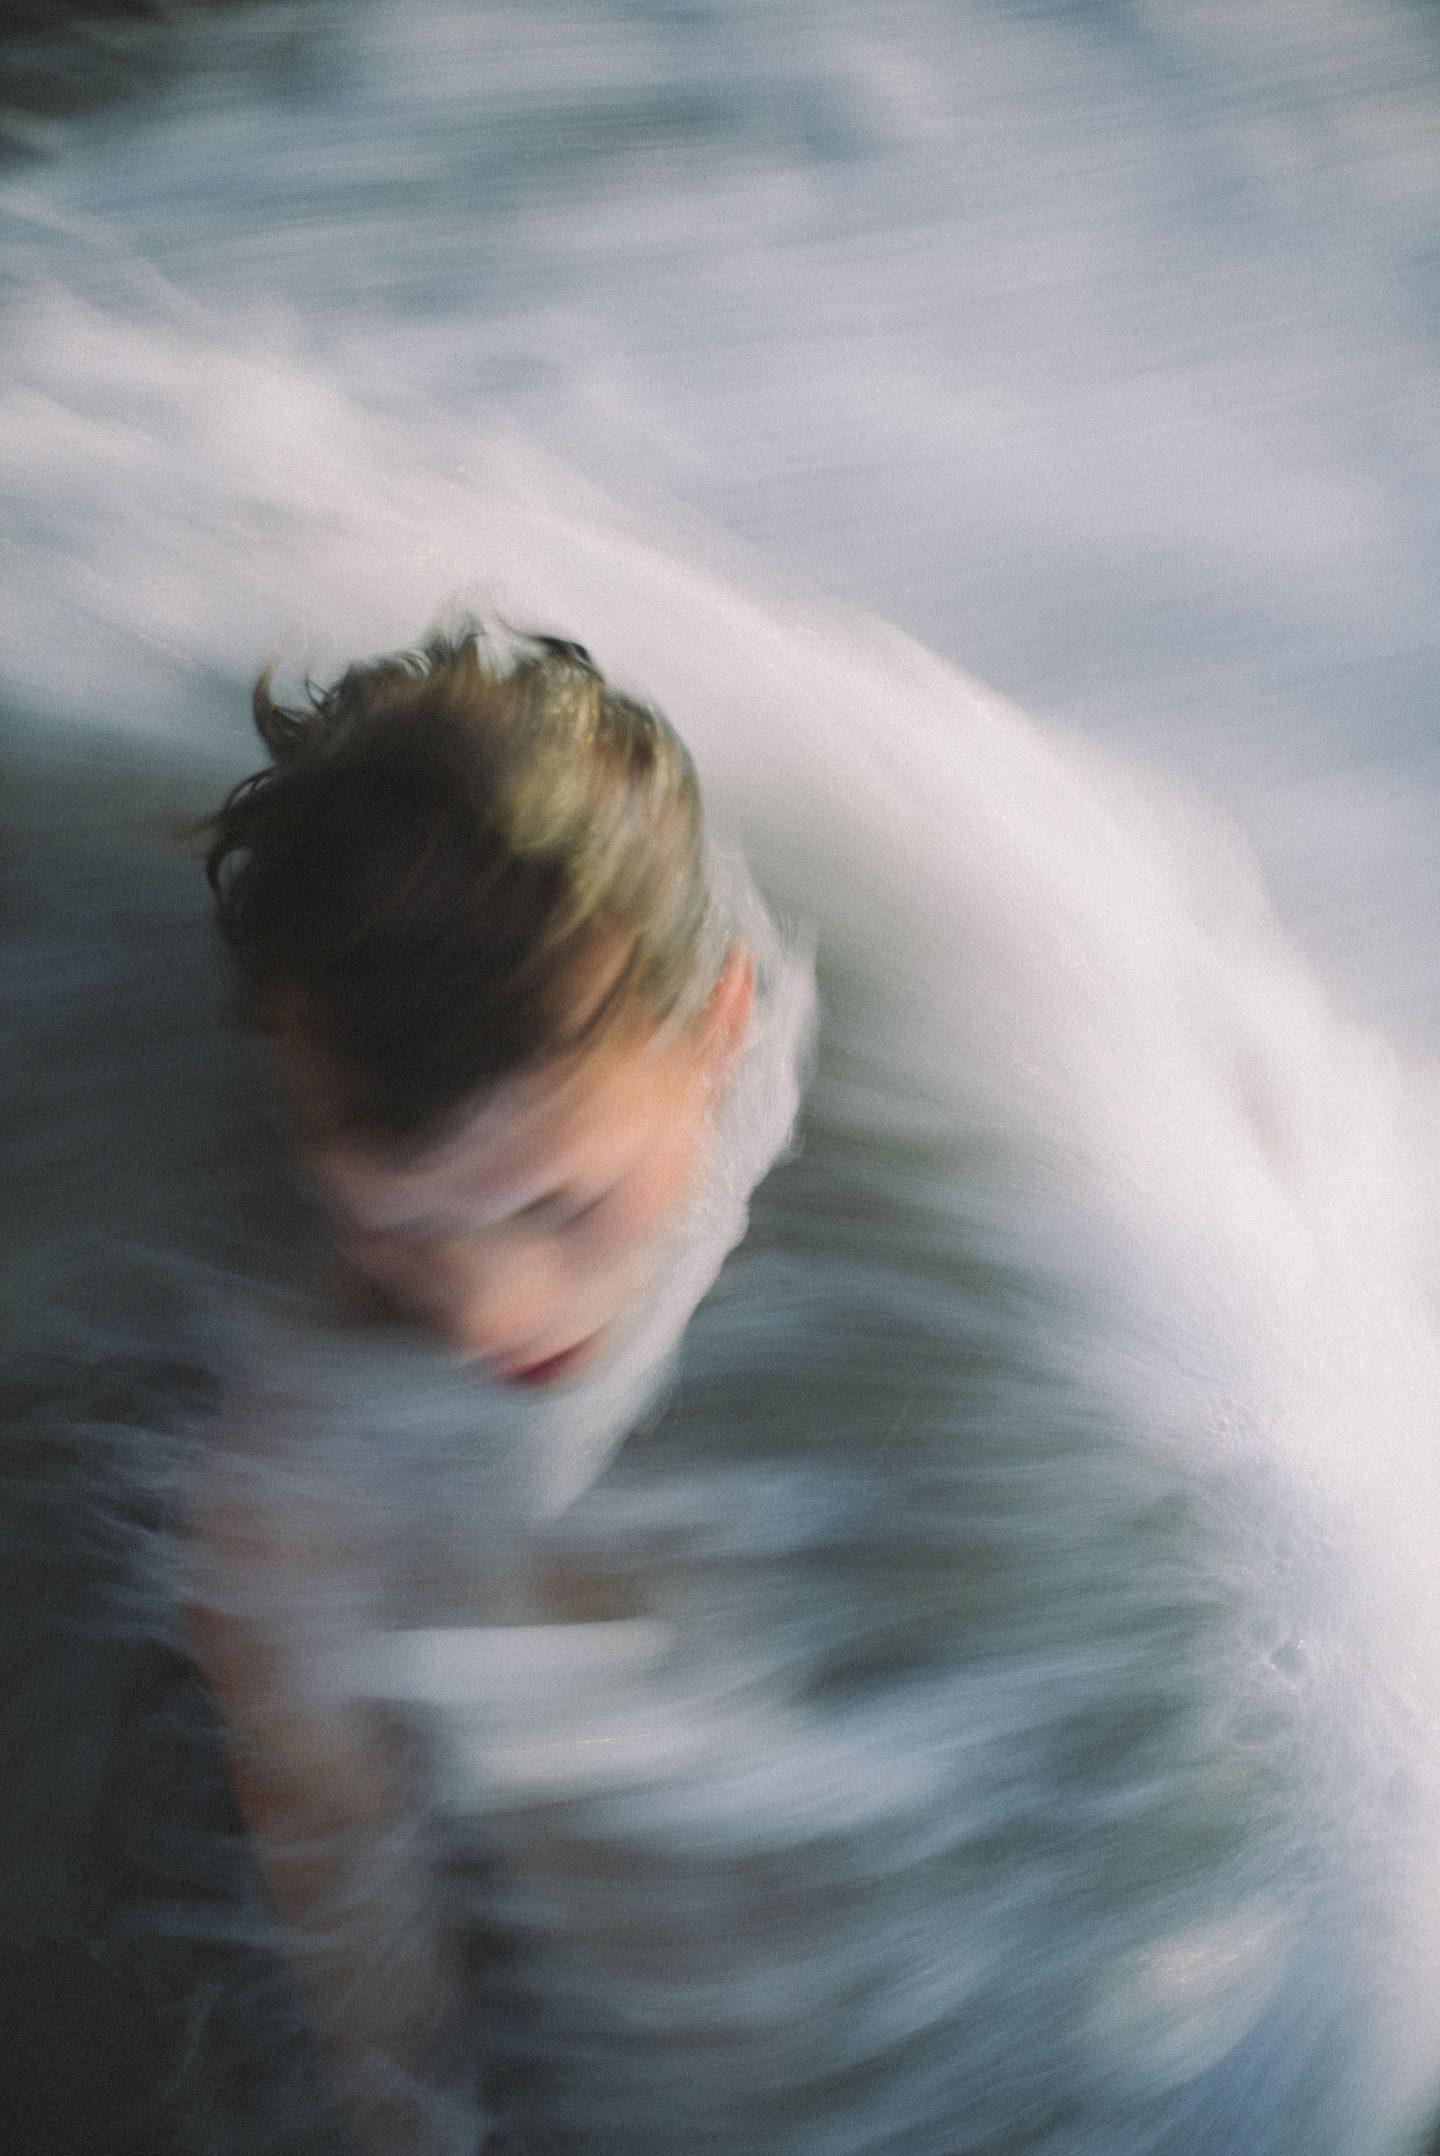 IGNANT-Photography-David-van-Dartel-This-Time-Tomorrow-02